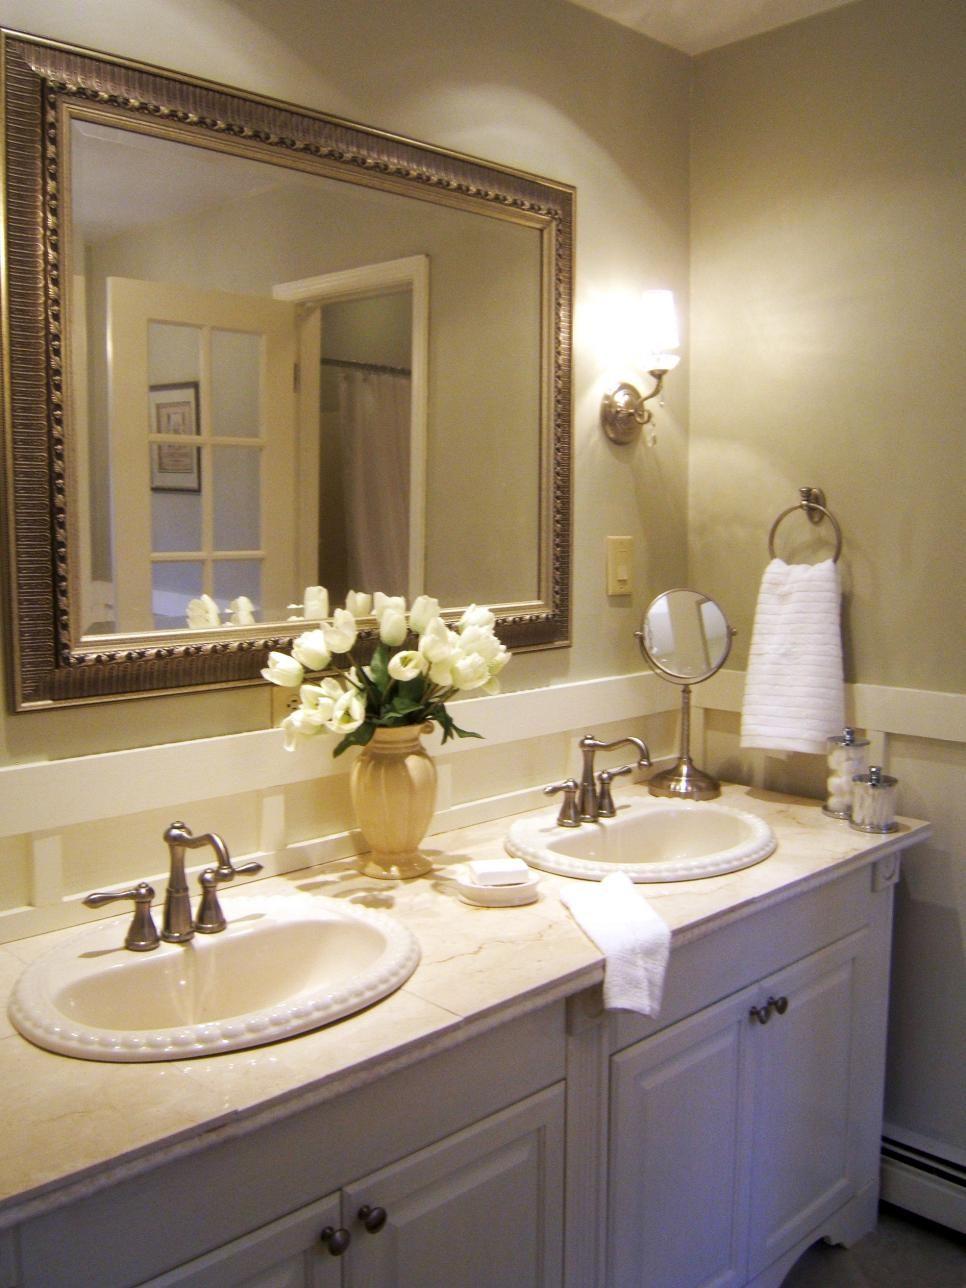 Hgtv rate my space bathrooms - Budget Bathroom Makeovers